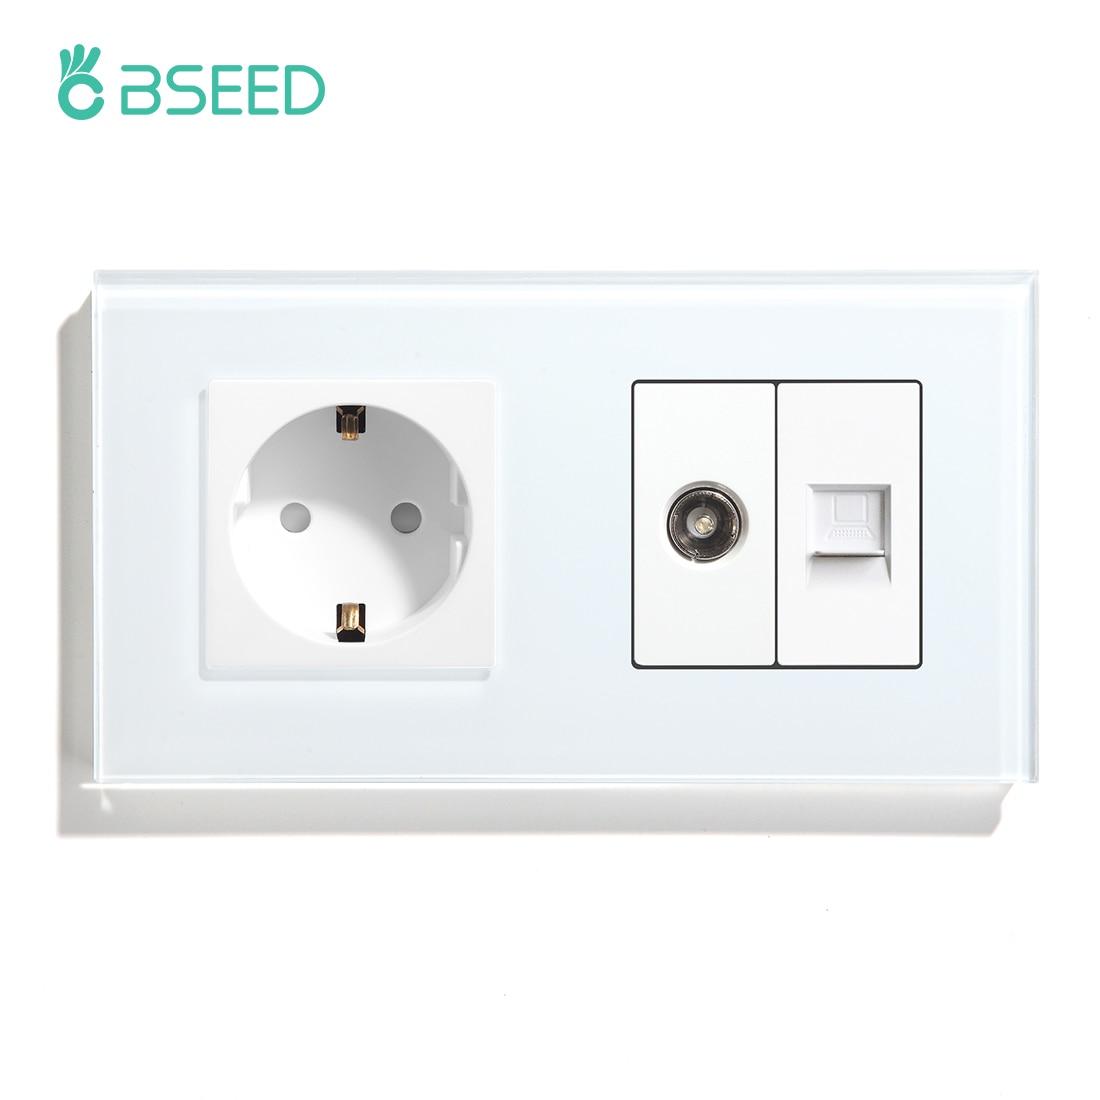 BSEED-مقبس حائط فردي ، مقبس حائط قياسي أوروبي ، مع تلفزيون ، كمبيوتر شخصي ، لوحة زجاجية كريستالية ، أبيض ، أسود ، ذهبي ، 110 فولت ، 250 فولت